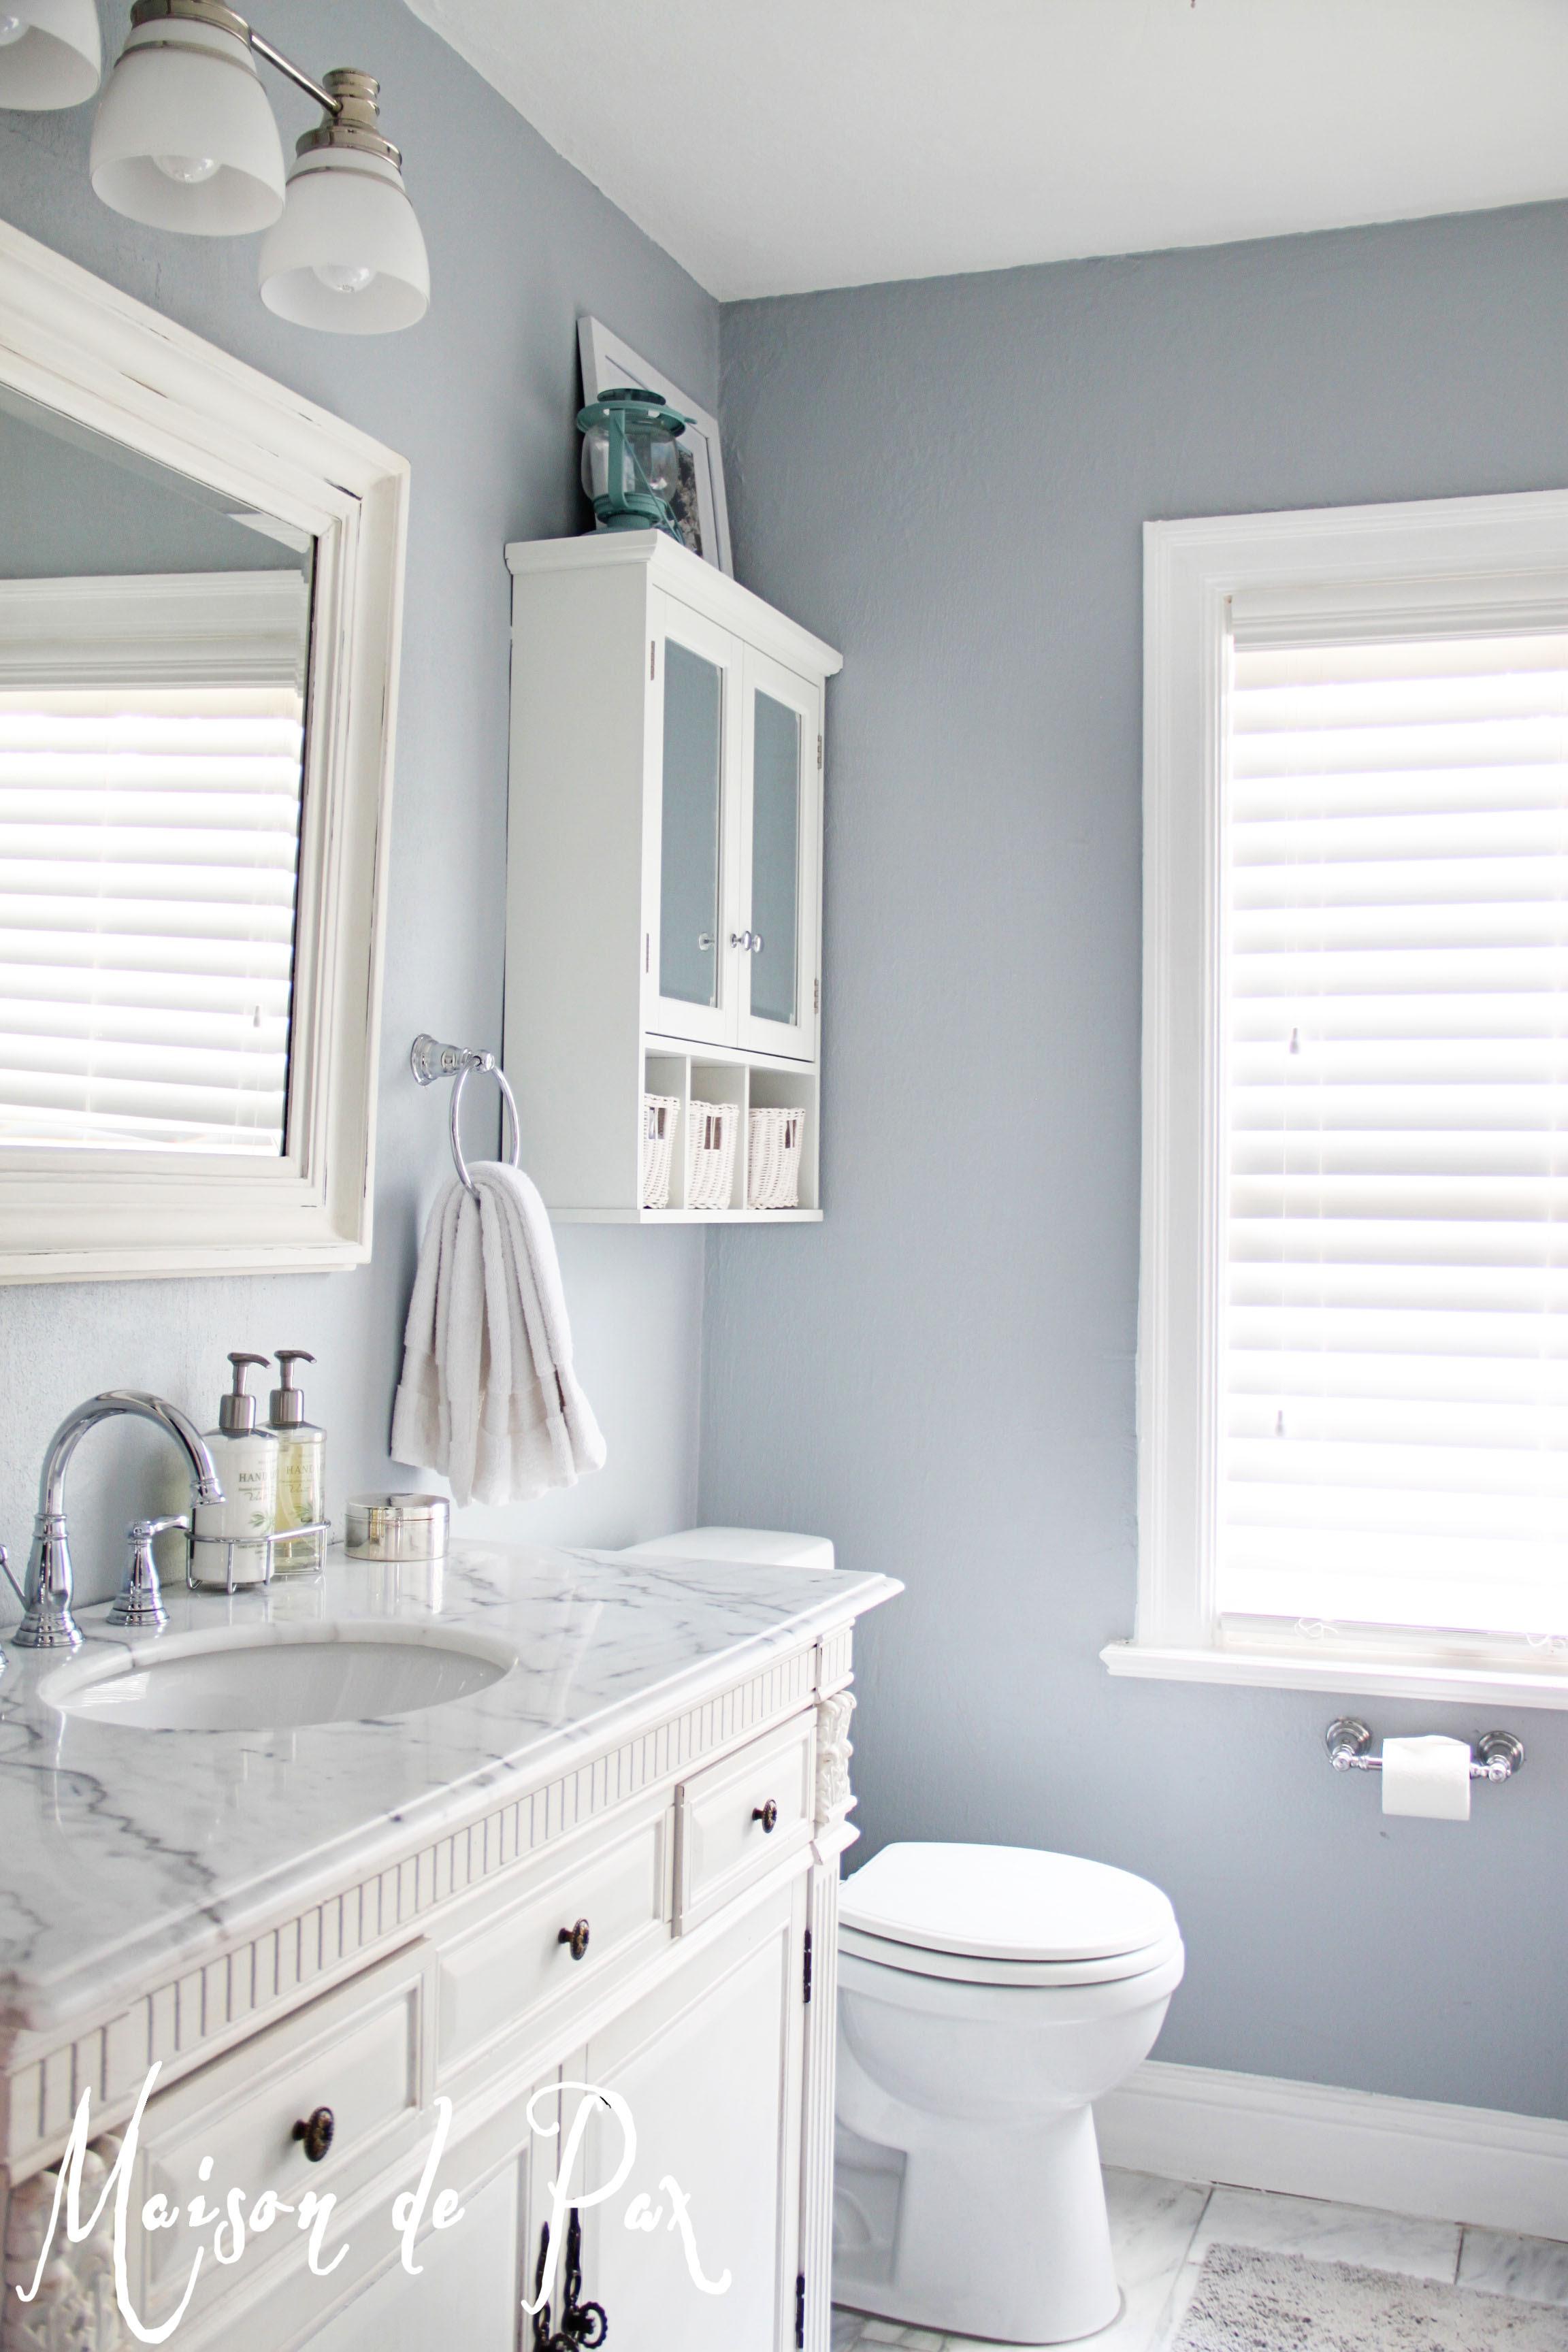 12 Inspiring Bathroom Makeovers - House by Hoff